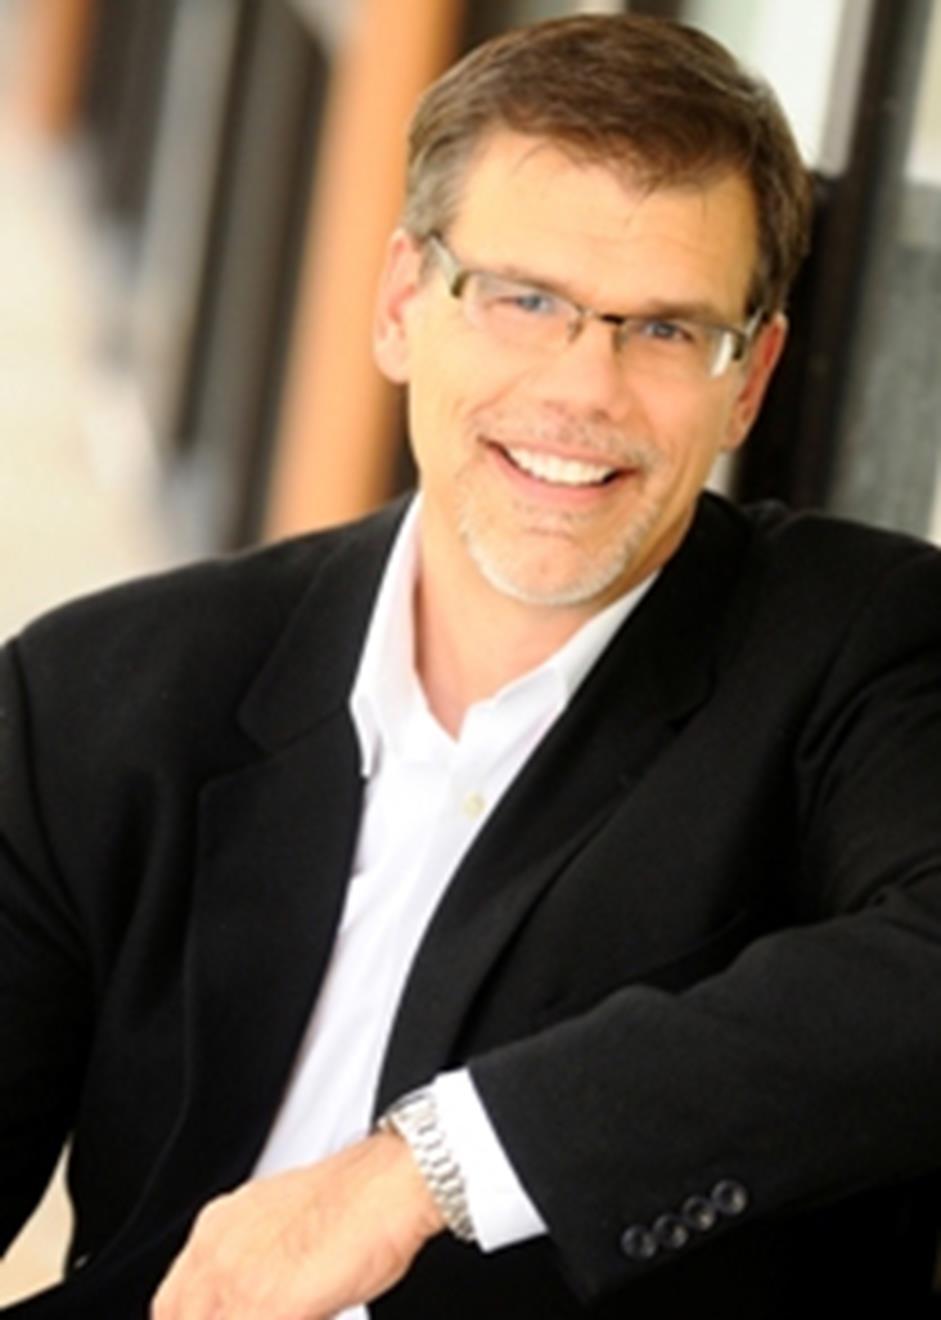 David Brunner